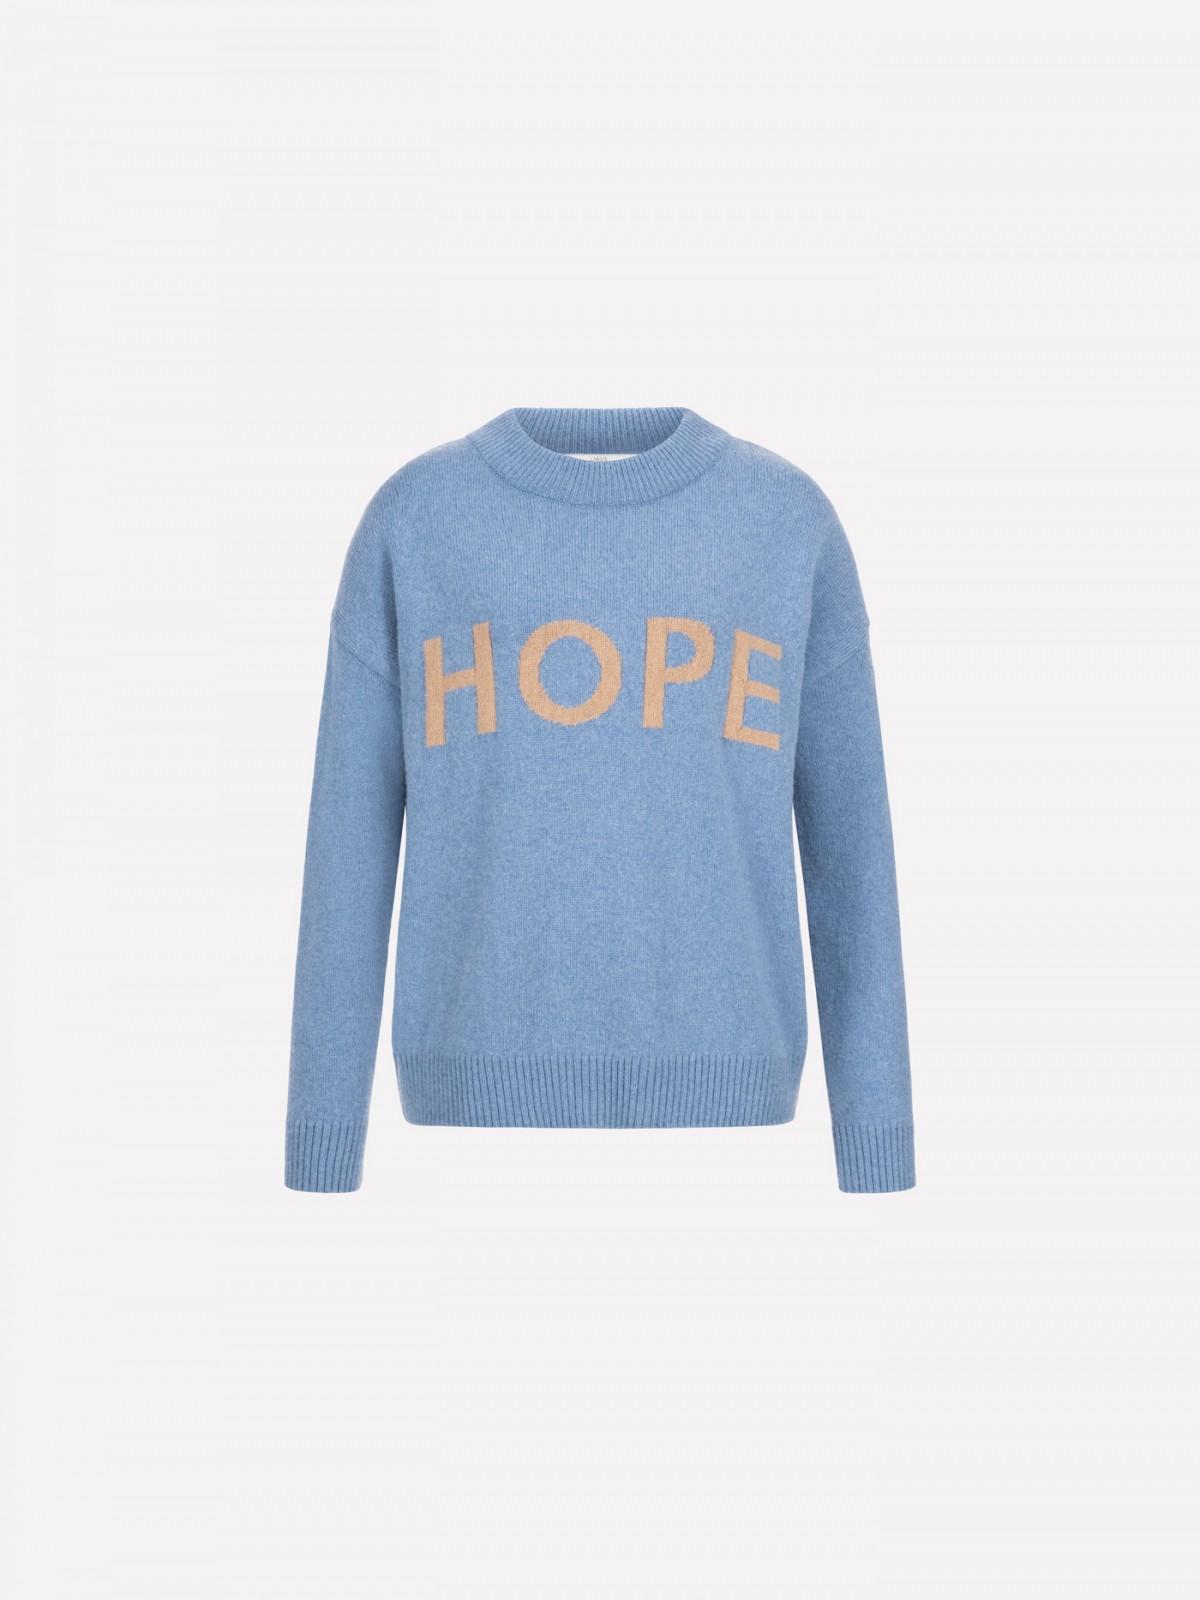 Statement jumper HOPE in organic virgin wool and organic cotton